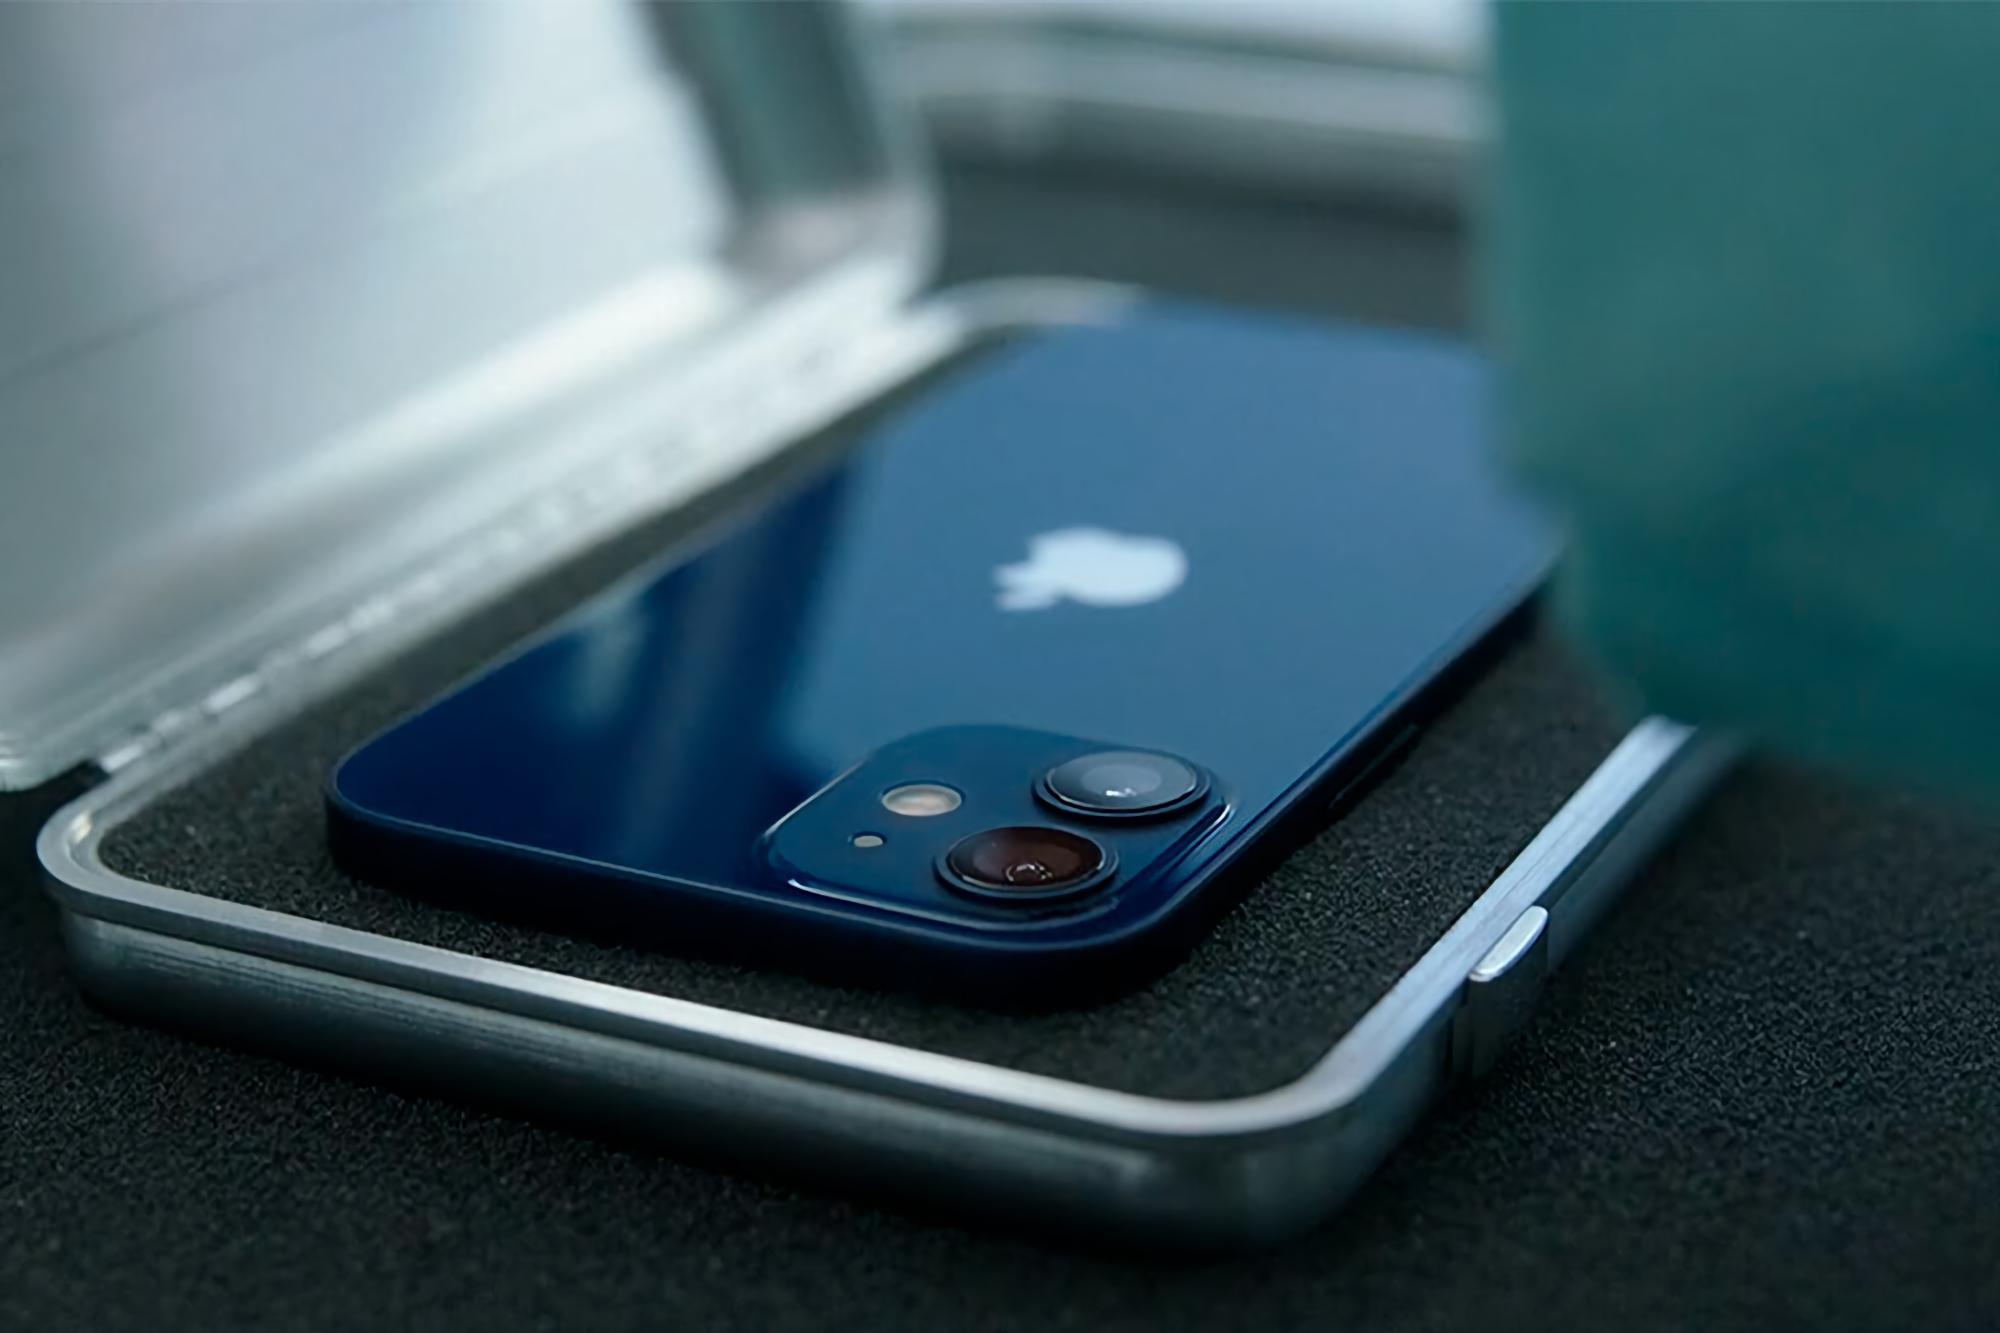 Apple открыла предзаказ на смартфоны iPhone 12 mini, iPhone 12 Pro Max и смарт-колонку HomePod mini